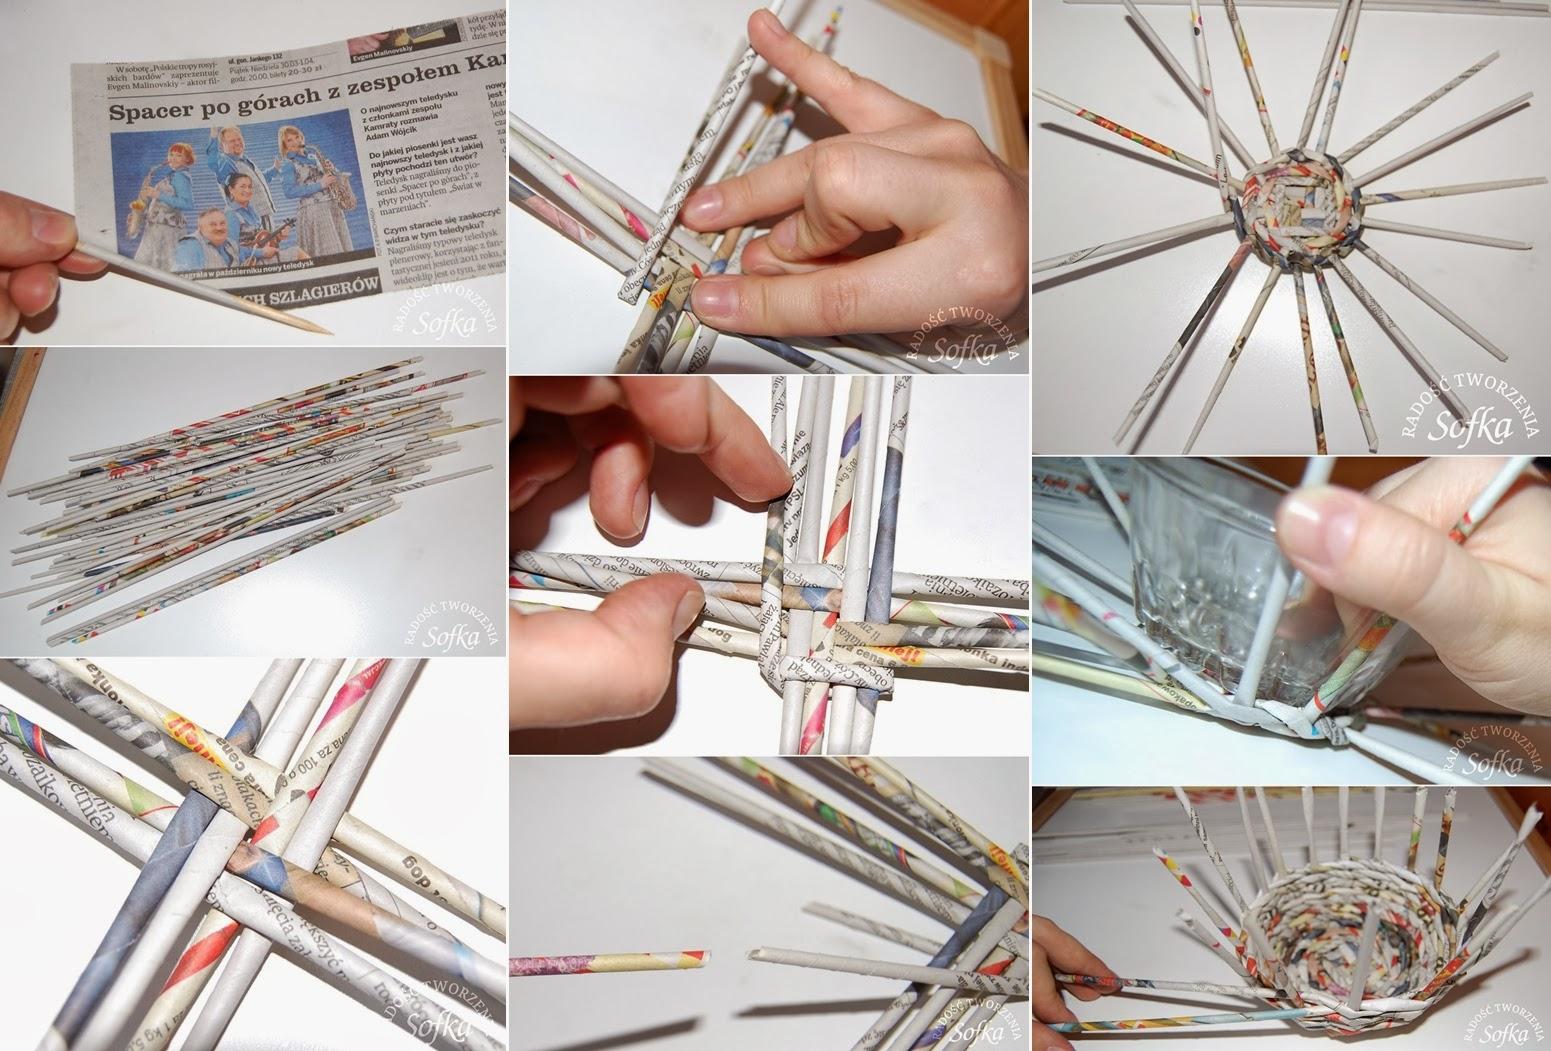 Basket Making Using Newspaper : Diy wicker basket using newspaper craft projects